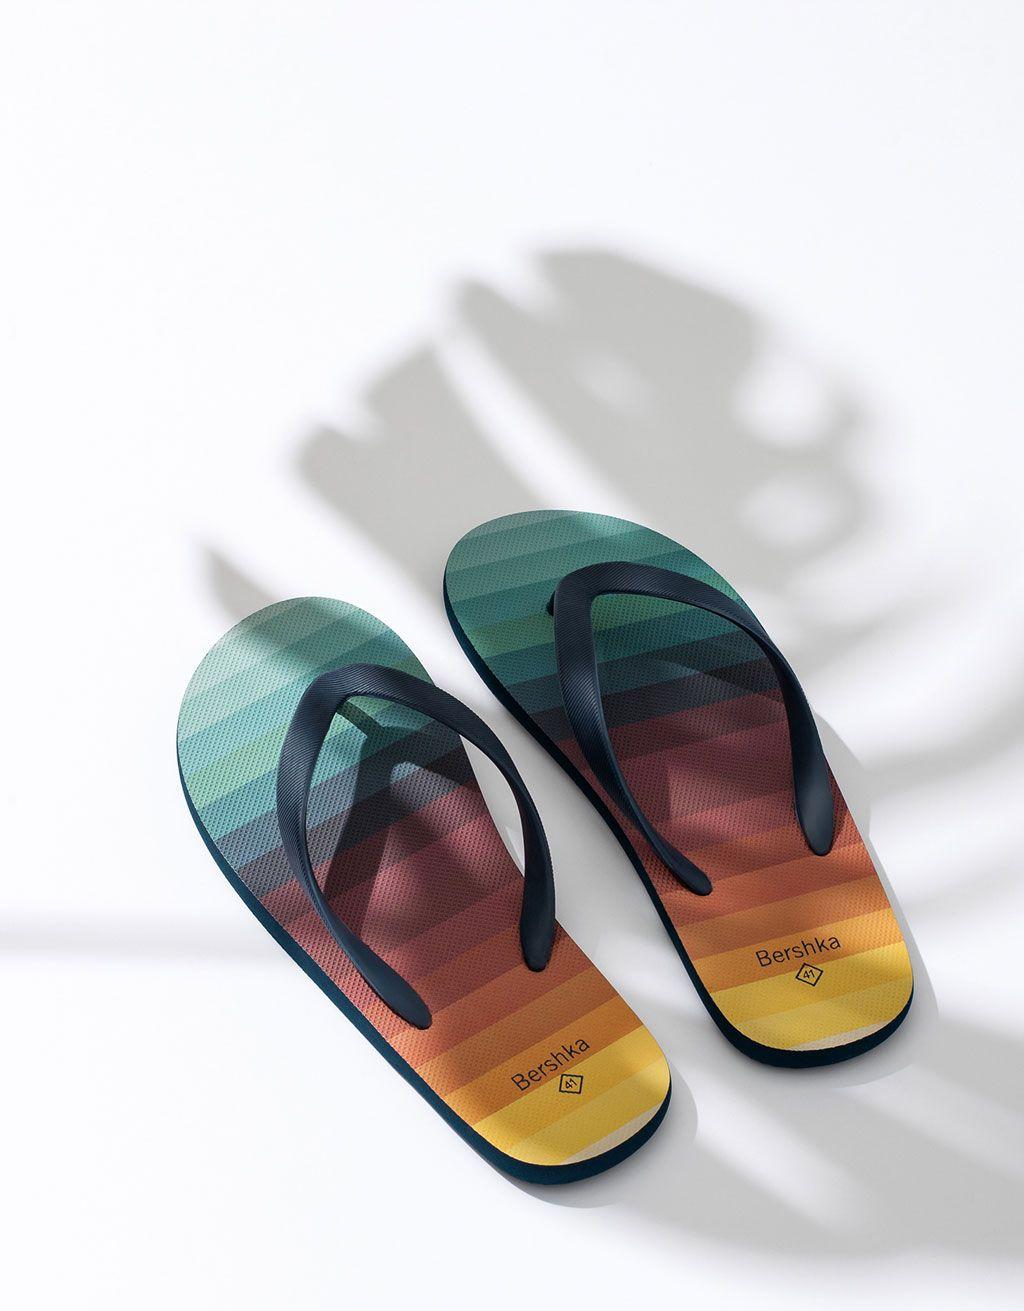 Thongs Sandals Comfort Slippers for Beach ALLAK Mens Flip-Flops